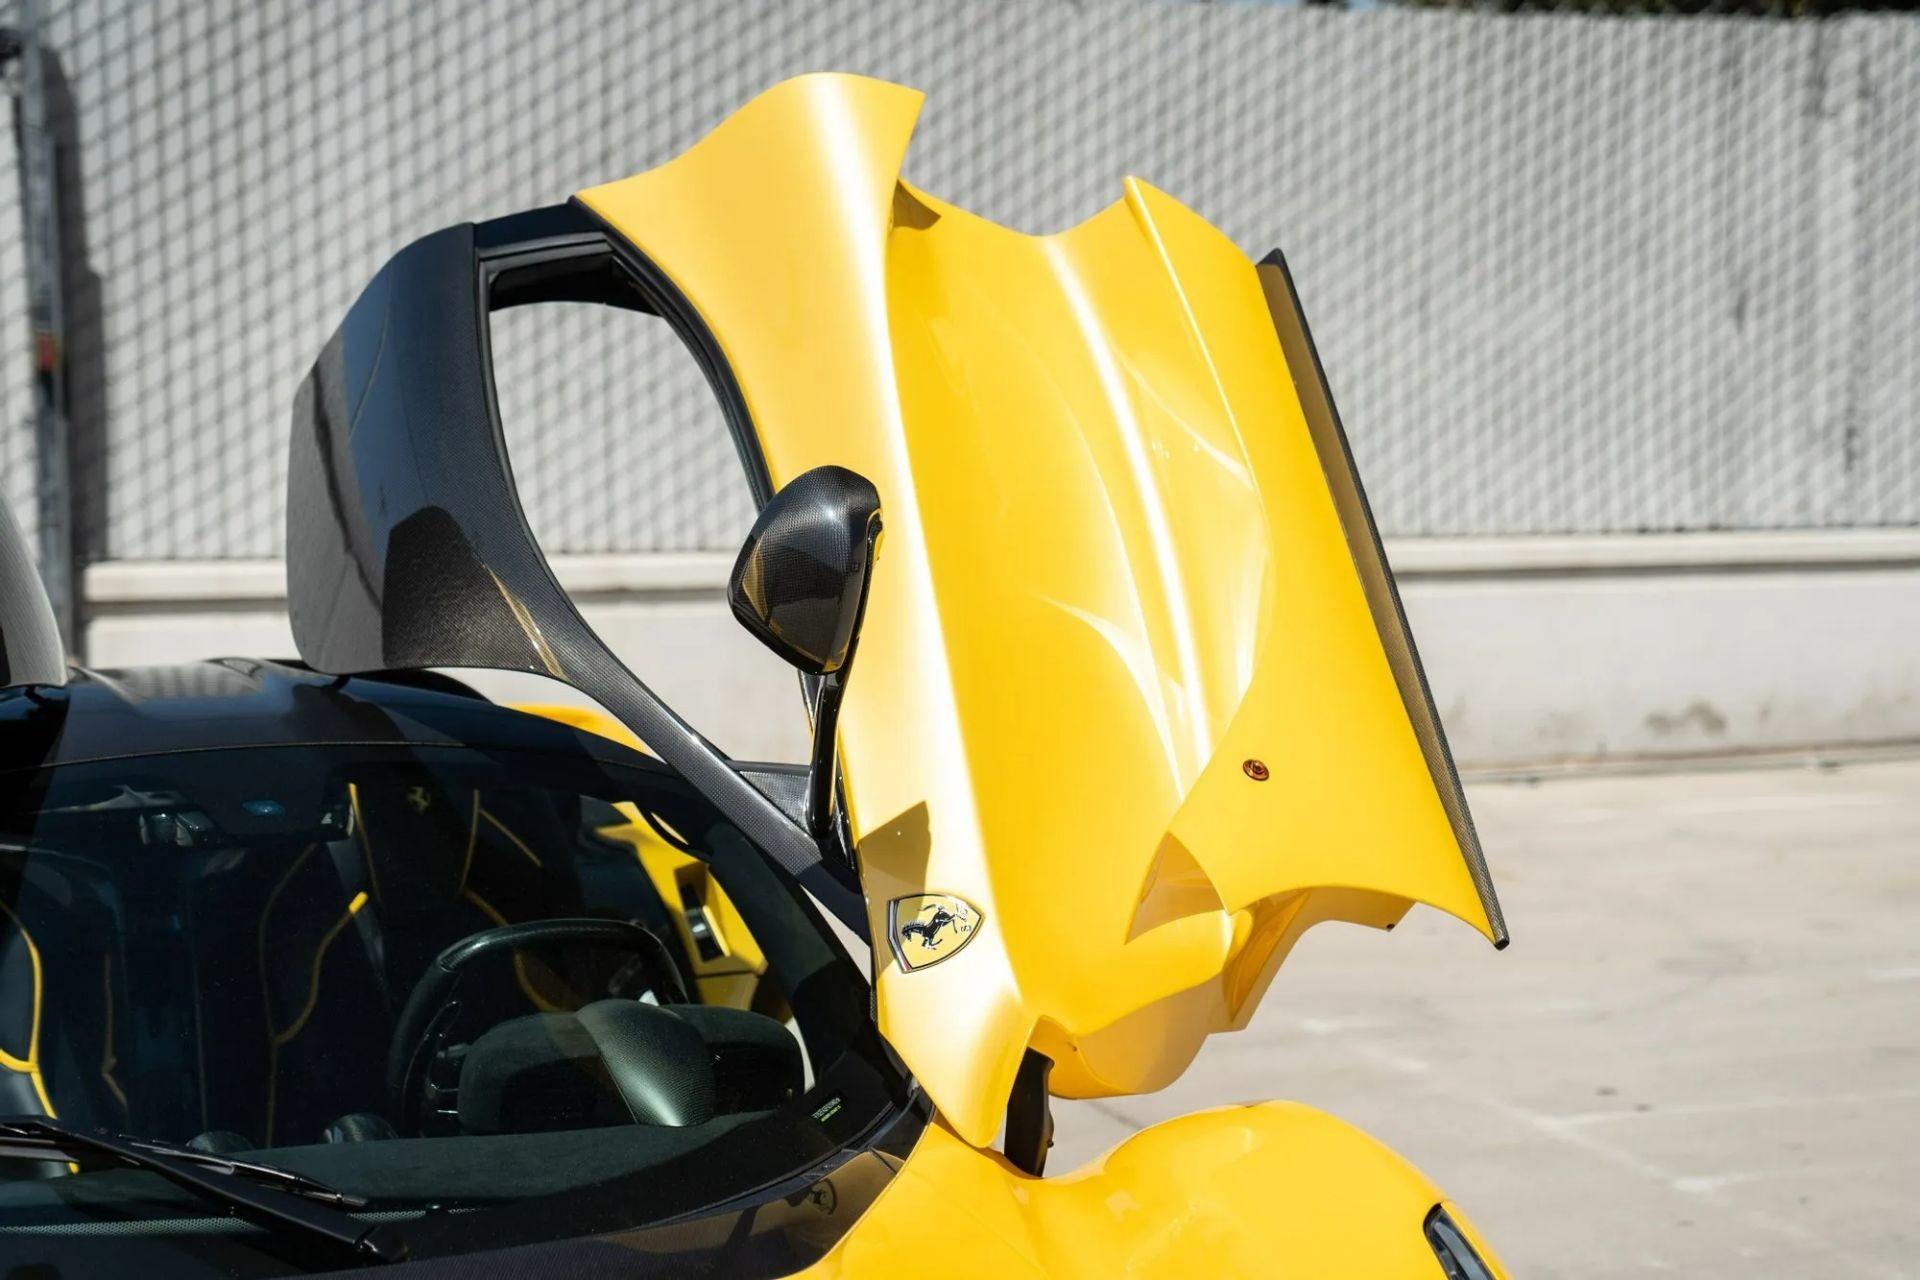 Ferrari LaFerrari, окрашенный уникальной краской Giallo Triplo Strato